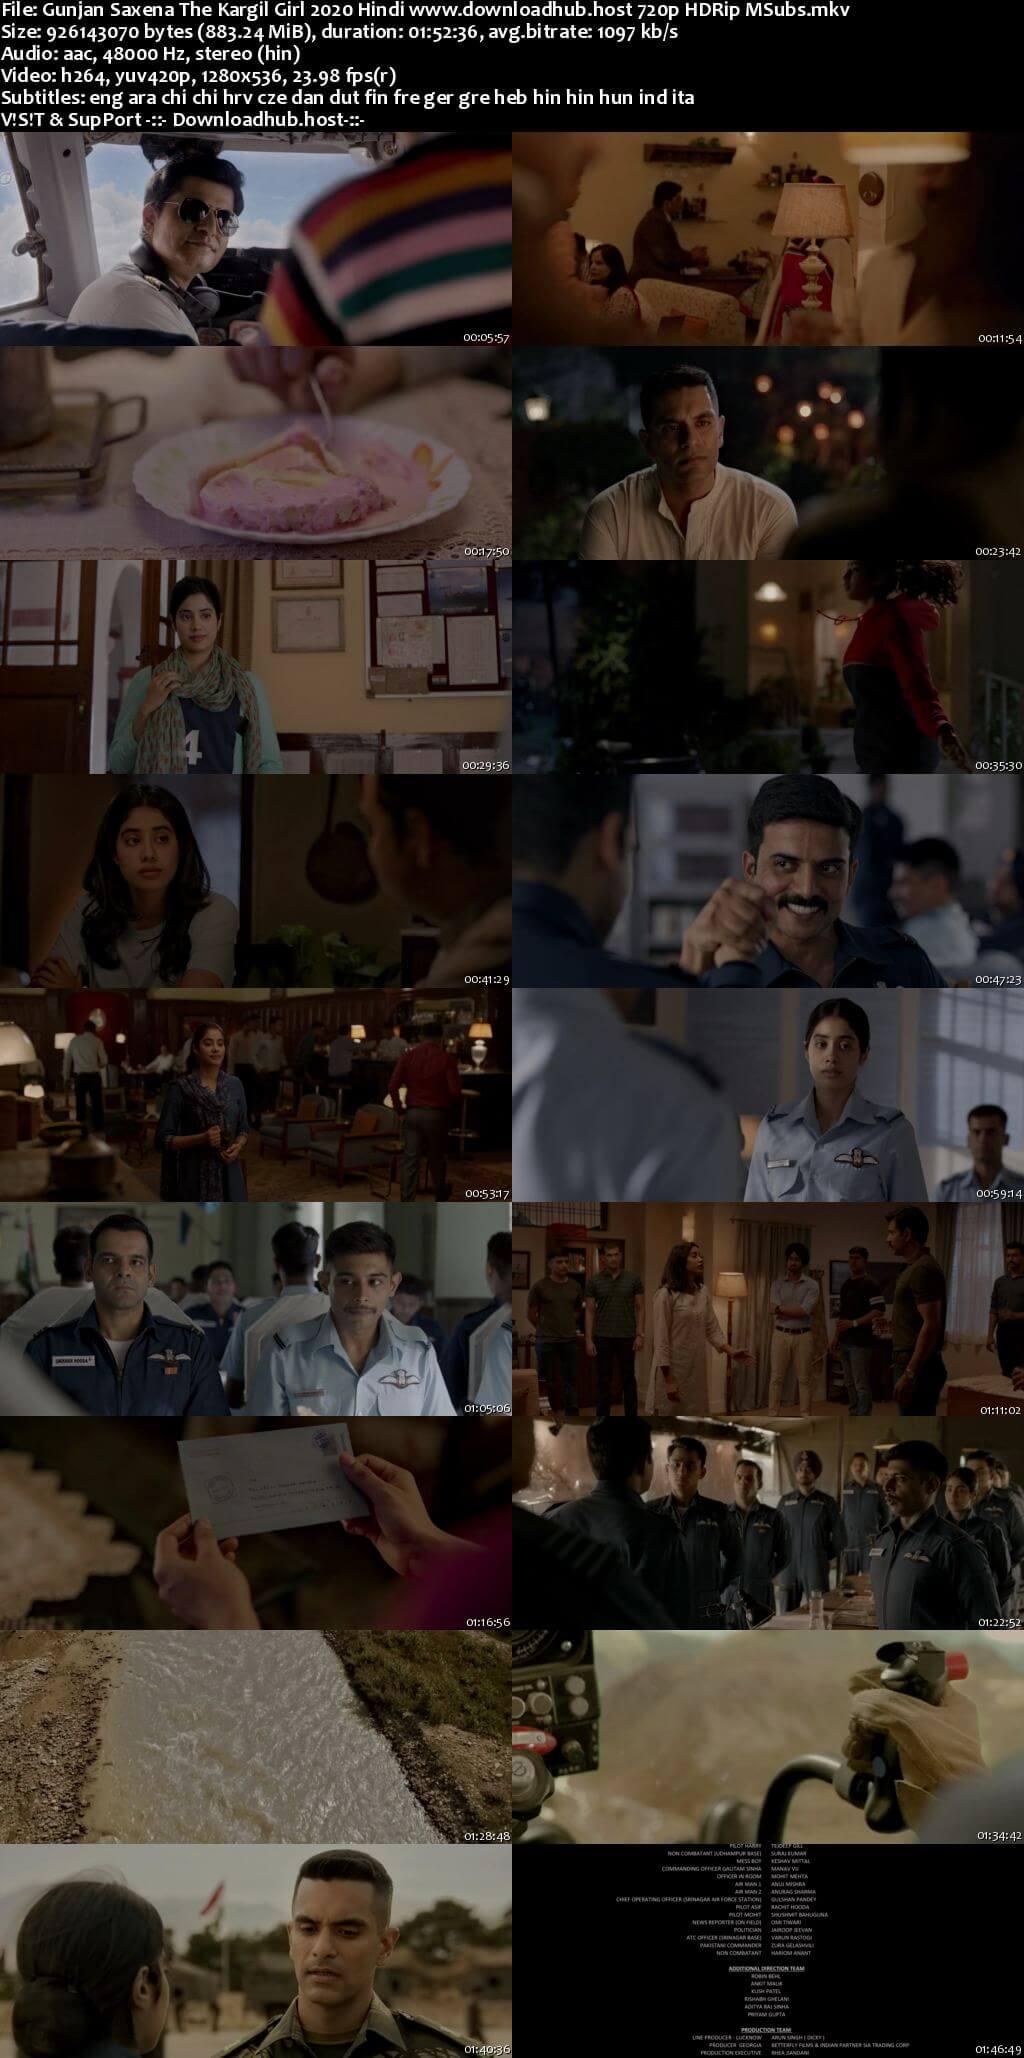 Gunjan Saxena The Kargil Girl 2020 Hindi 720p HDRip MSubs